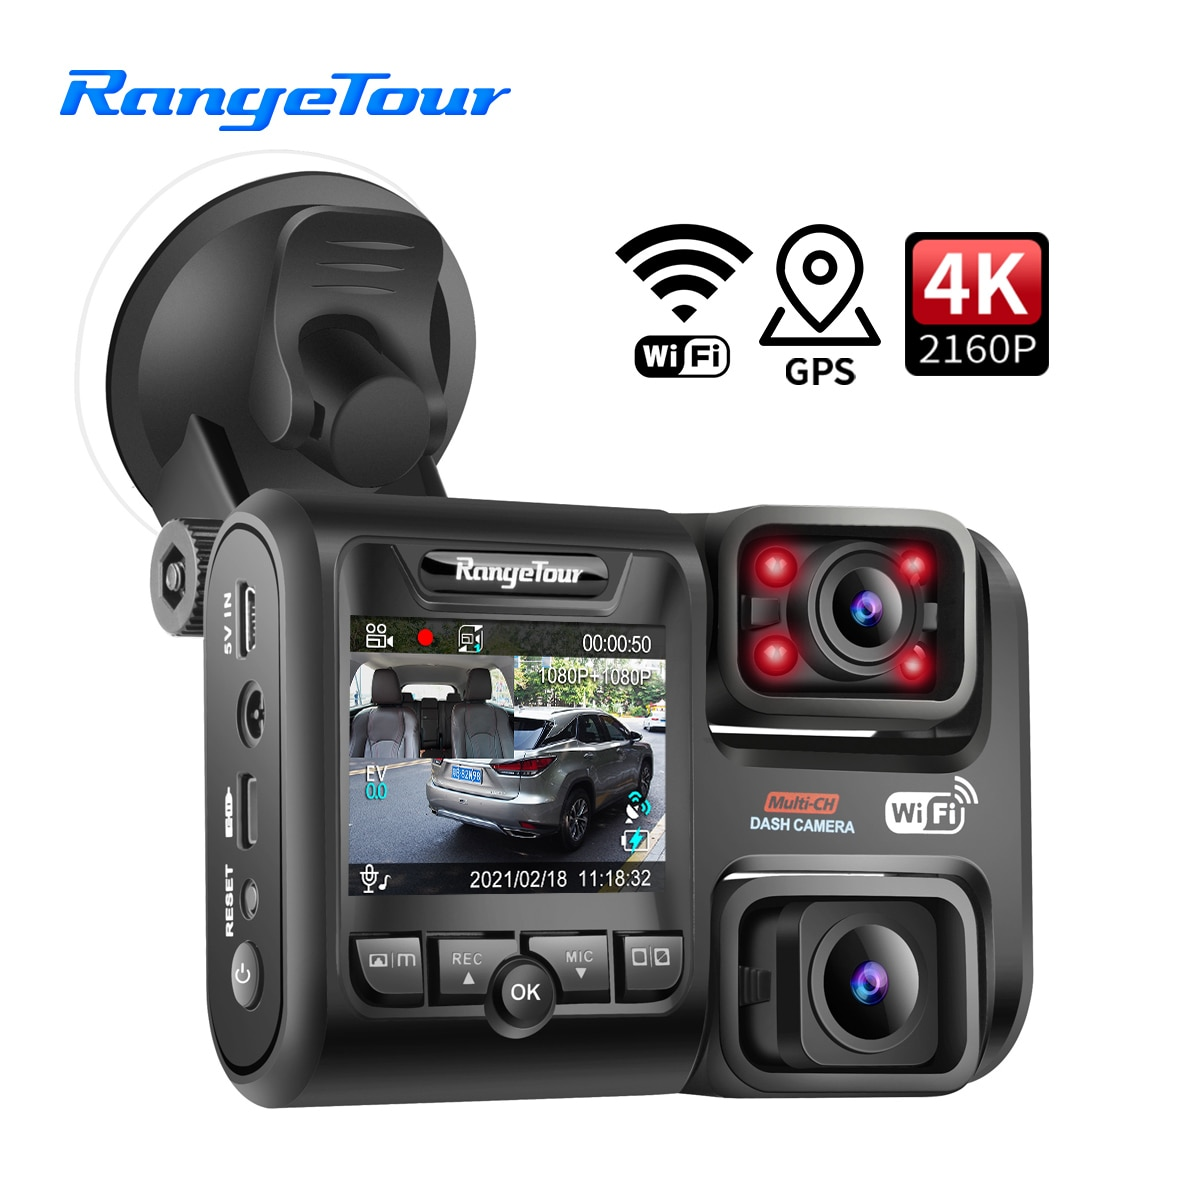 4K 2160P DVR D30H Dash Camera ، متوافق مع WiFi GPS ، كاميرا أمامية وكابينة ، 1080P 4 IR G ، مسجل فيديو ليلي